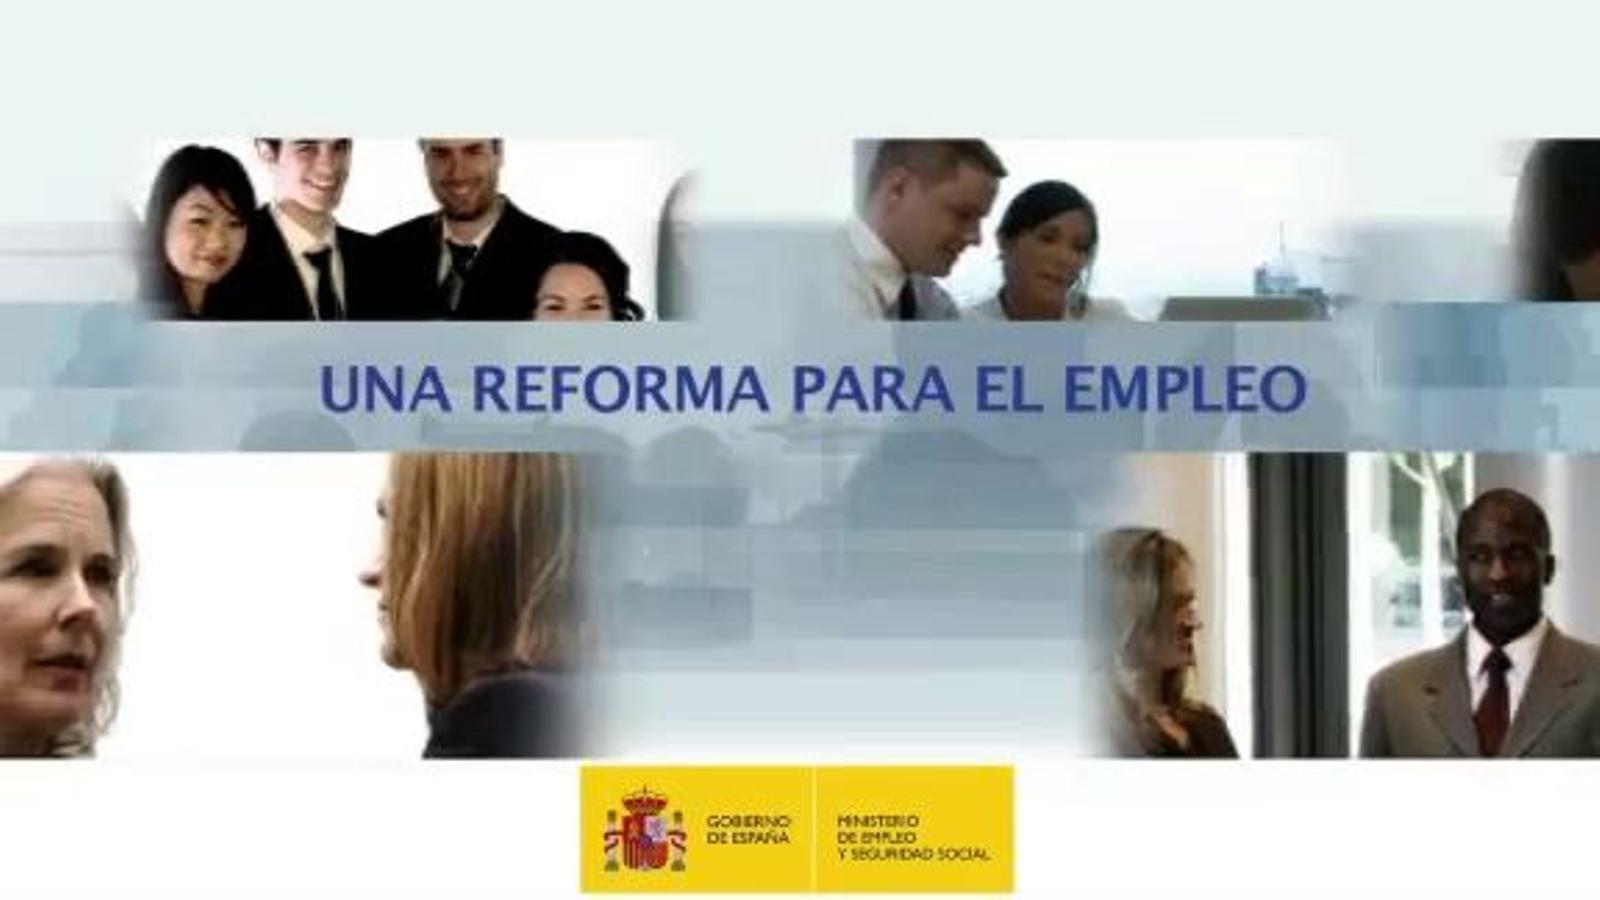 El govern espanyol respon als sindicats amb un vídeo propagandístic sobre la reforma laboral